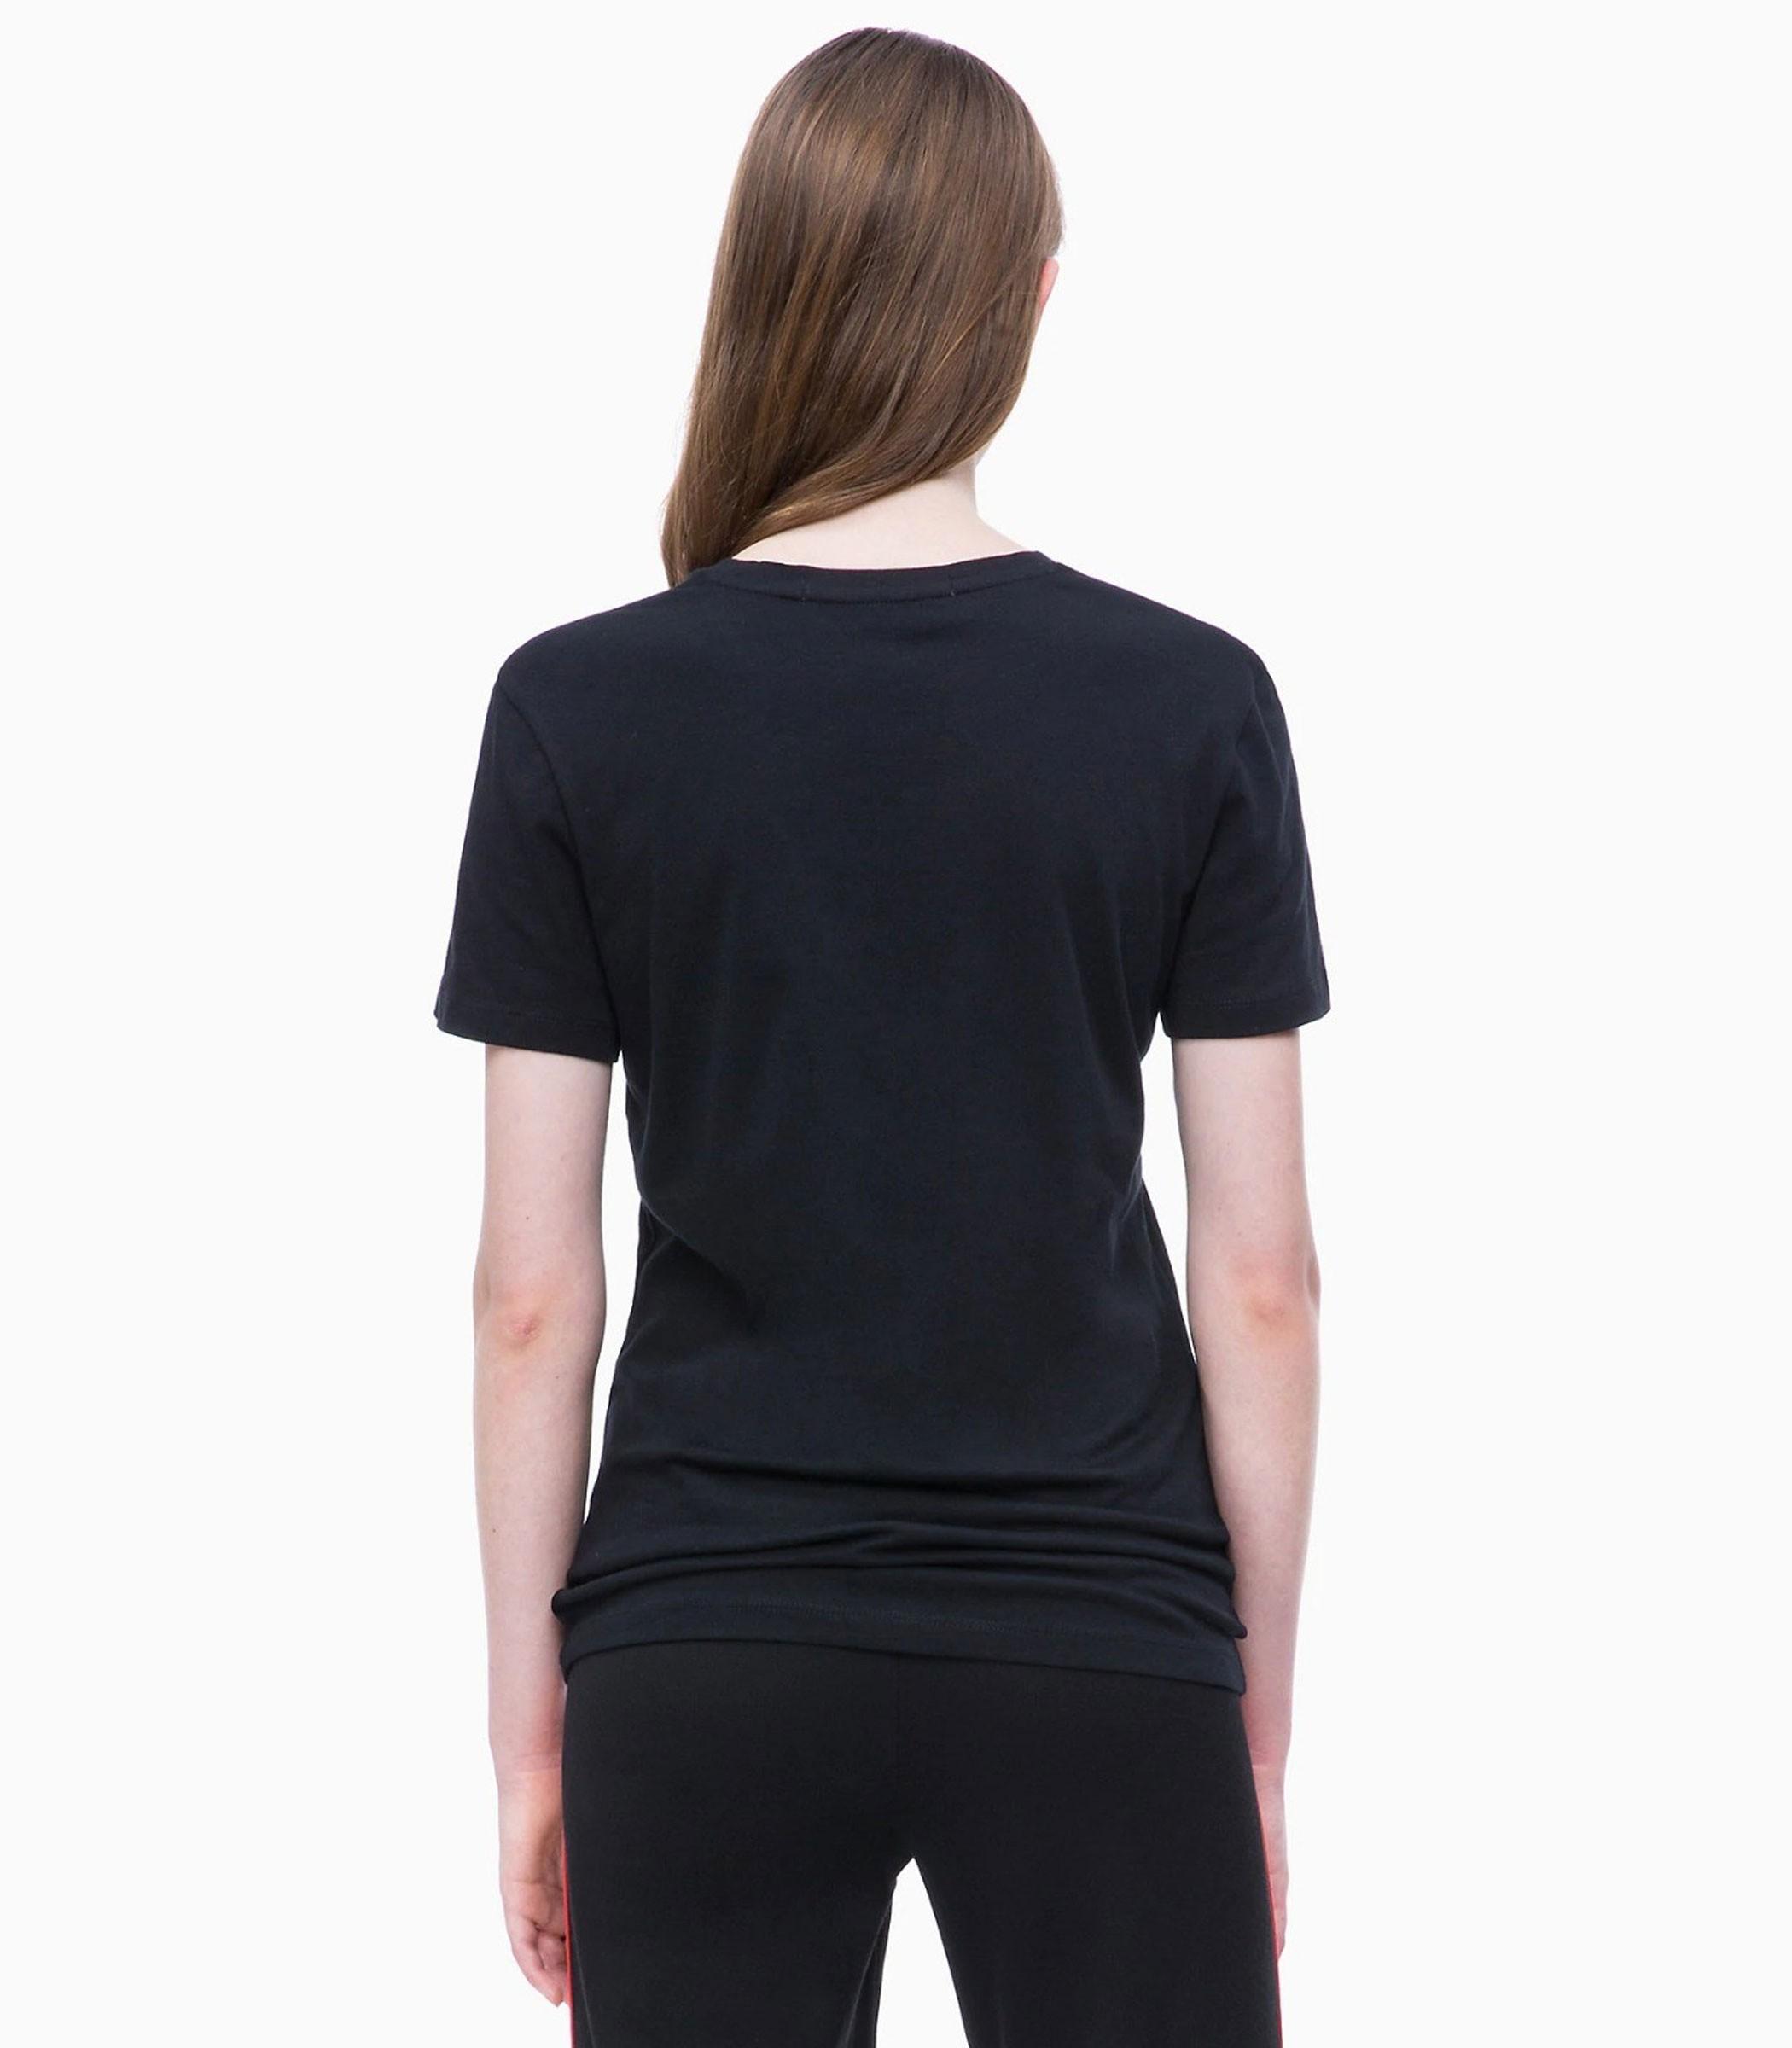 new product 4c8dd 76bda T-shirt Calvin Klein Jeans con logo da donna rif. J20J208600